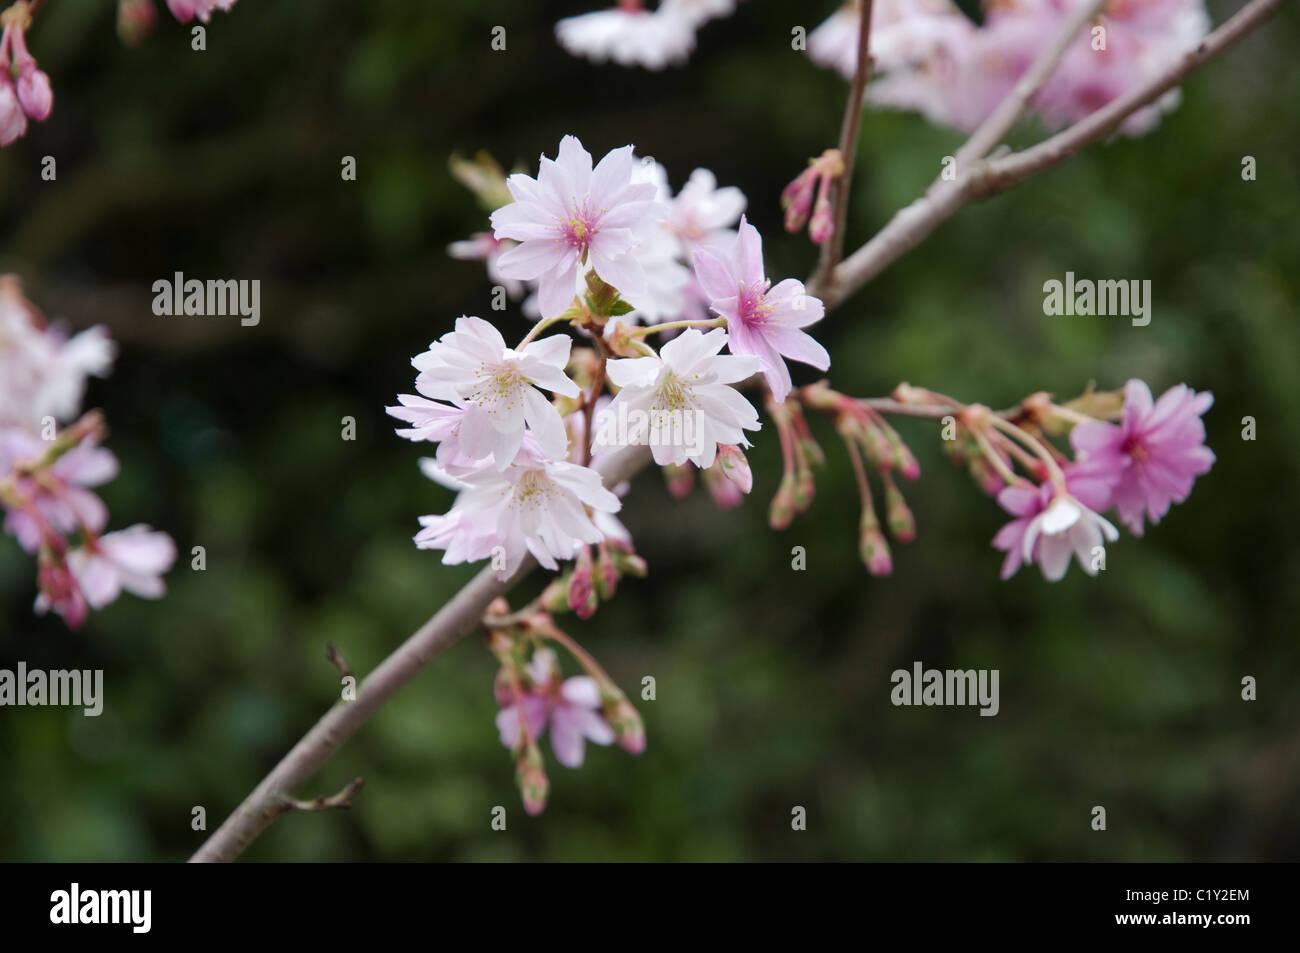 Prunus subhirtella Autumnalis - Pink in bud and tinged pink on opening - becoming white. The Winter Flowering Cherry. - Stock Image